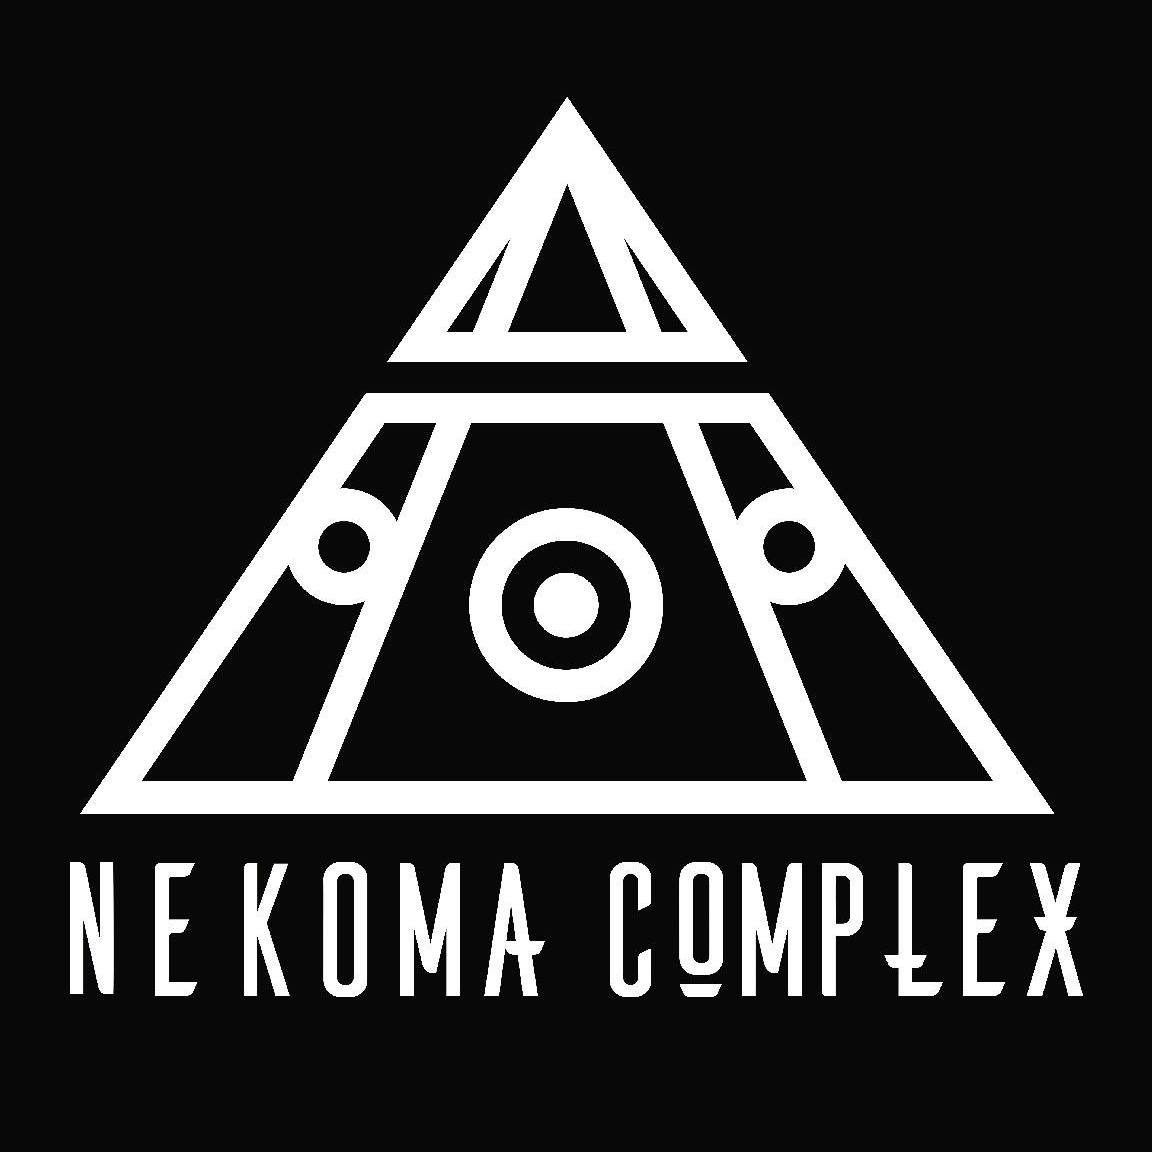 Nekoma Complex - 11:57 [single] (2017)